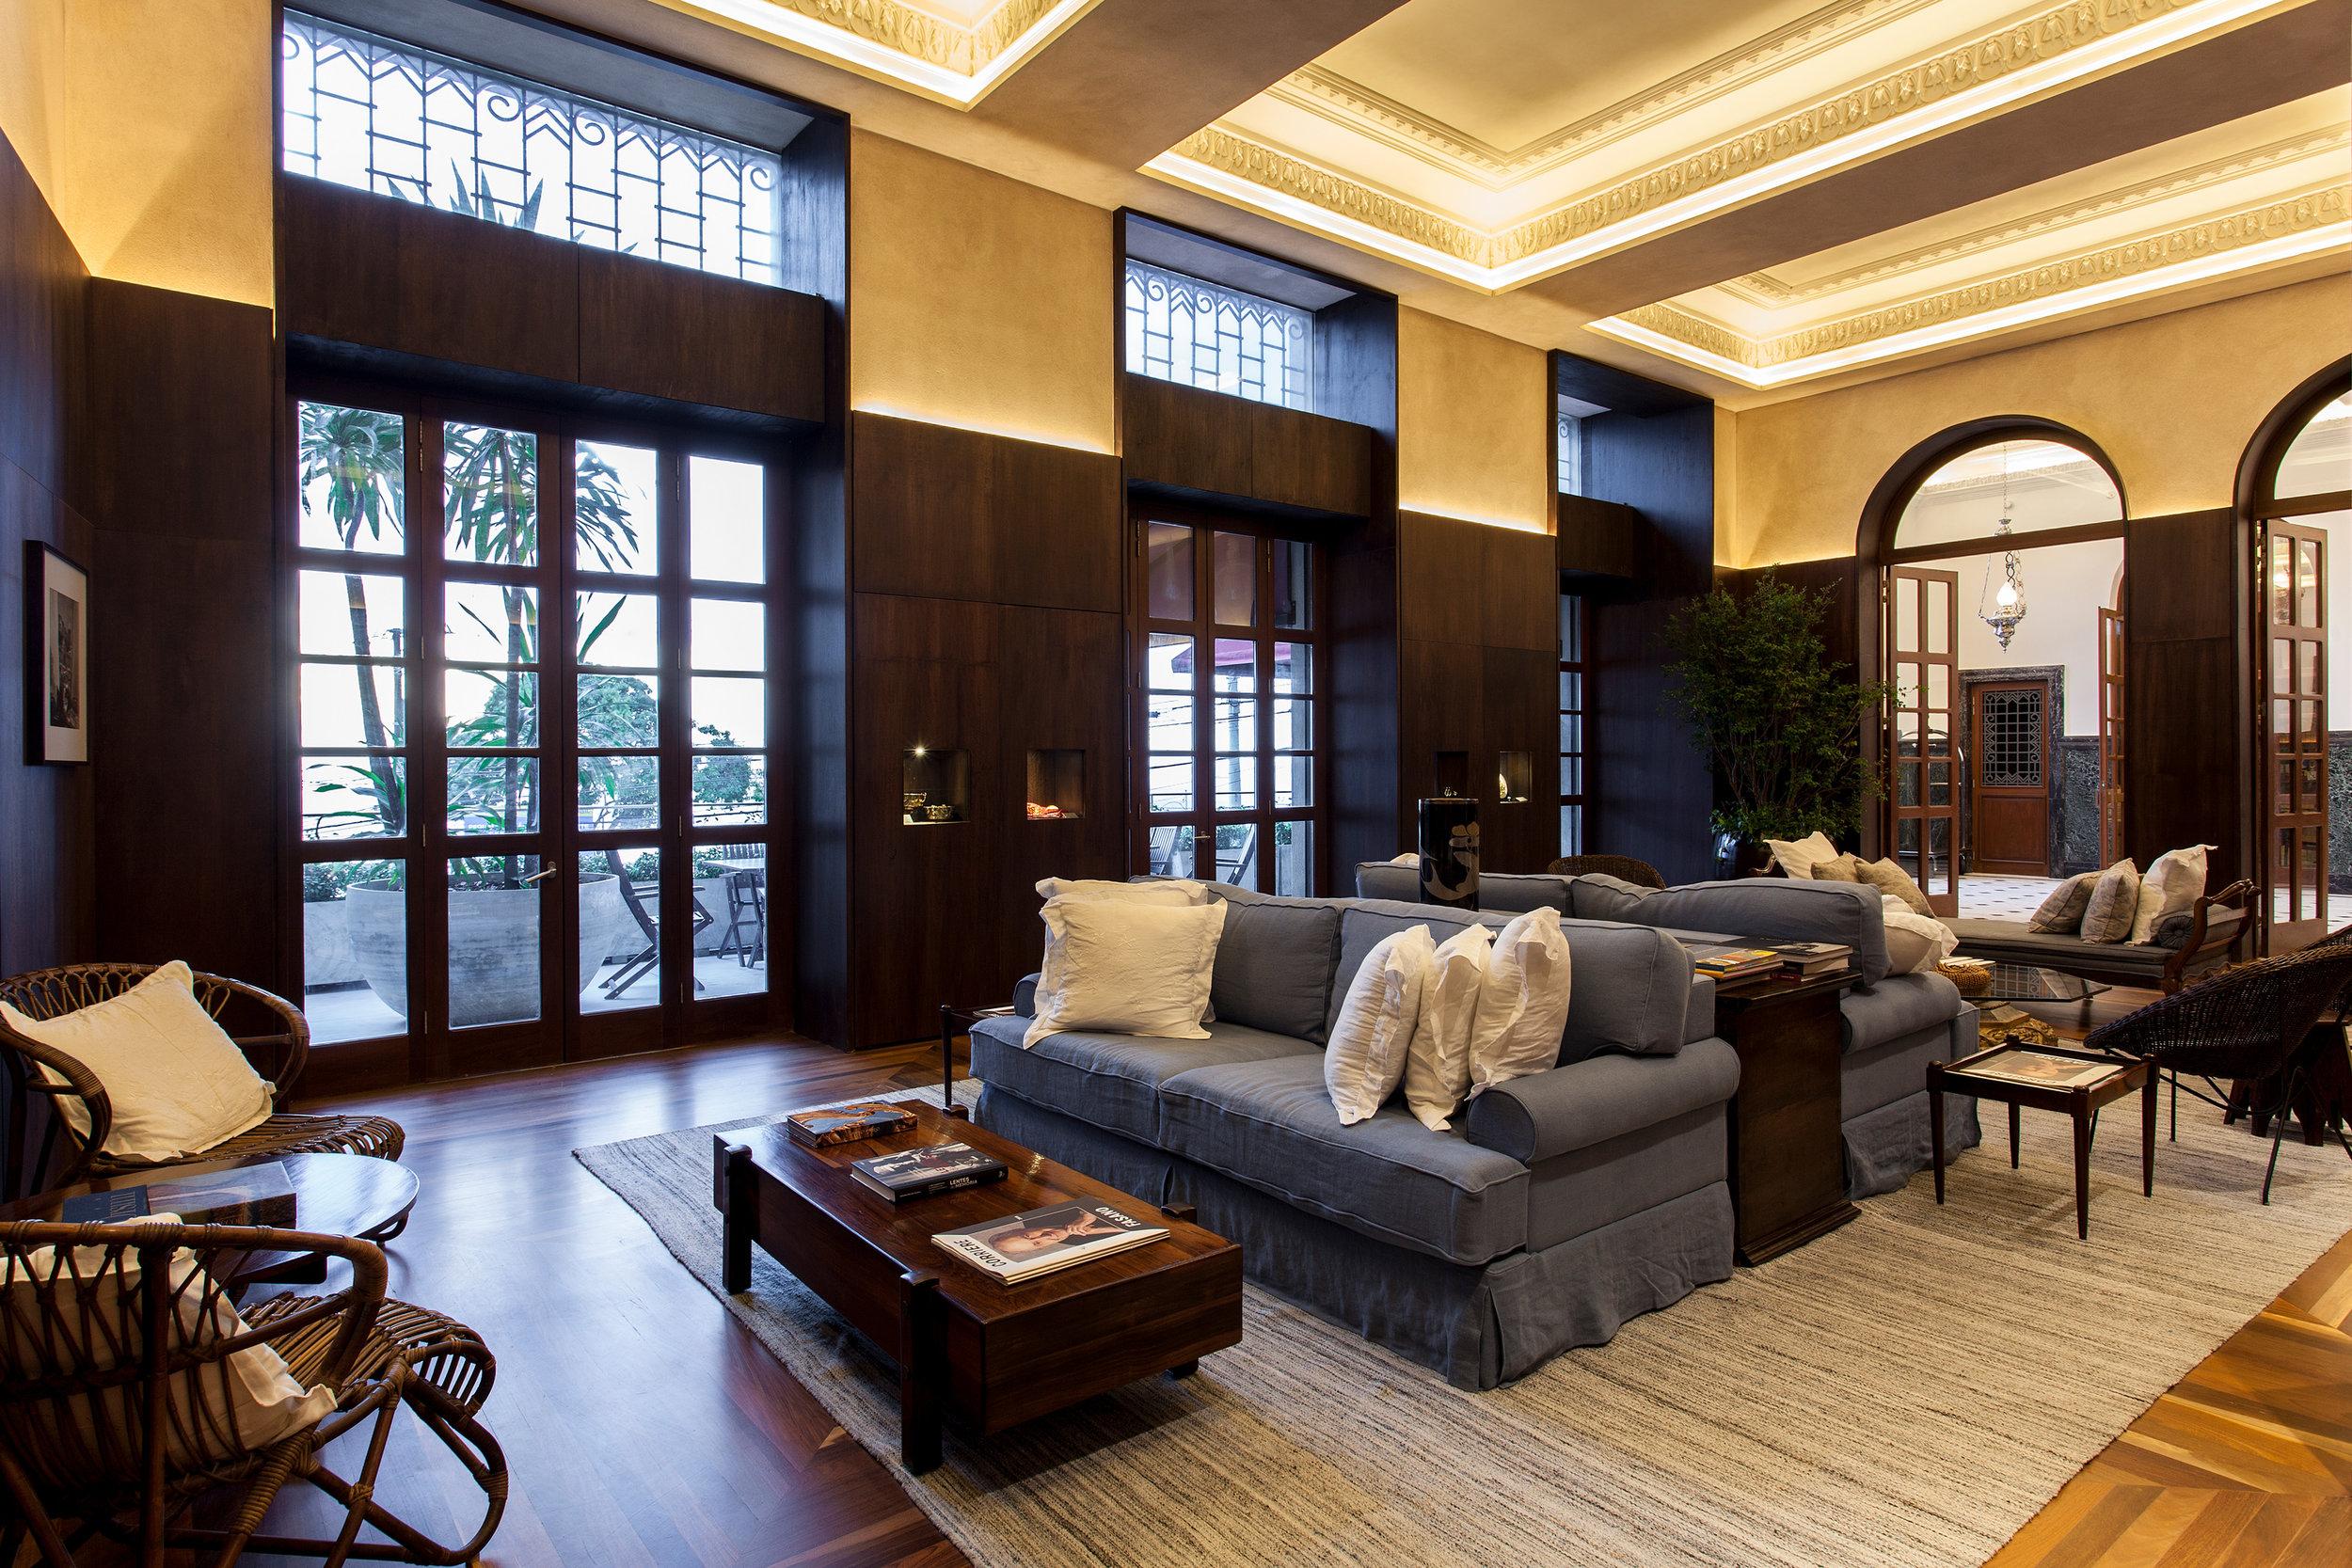 Hotel Fasano Salvador - Lobby.jpg